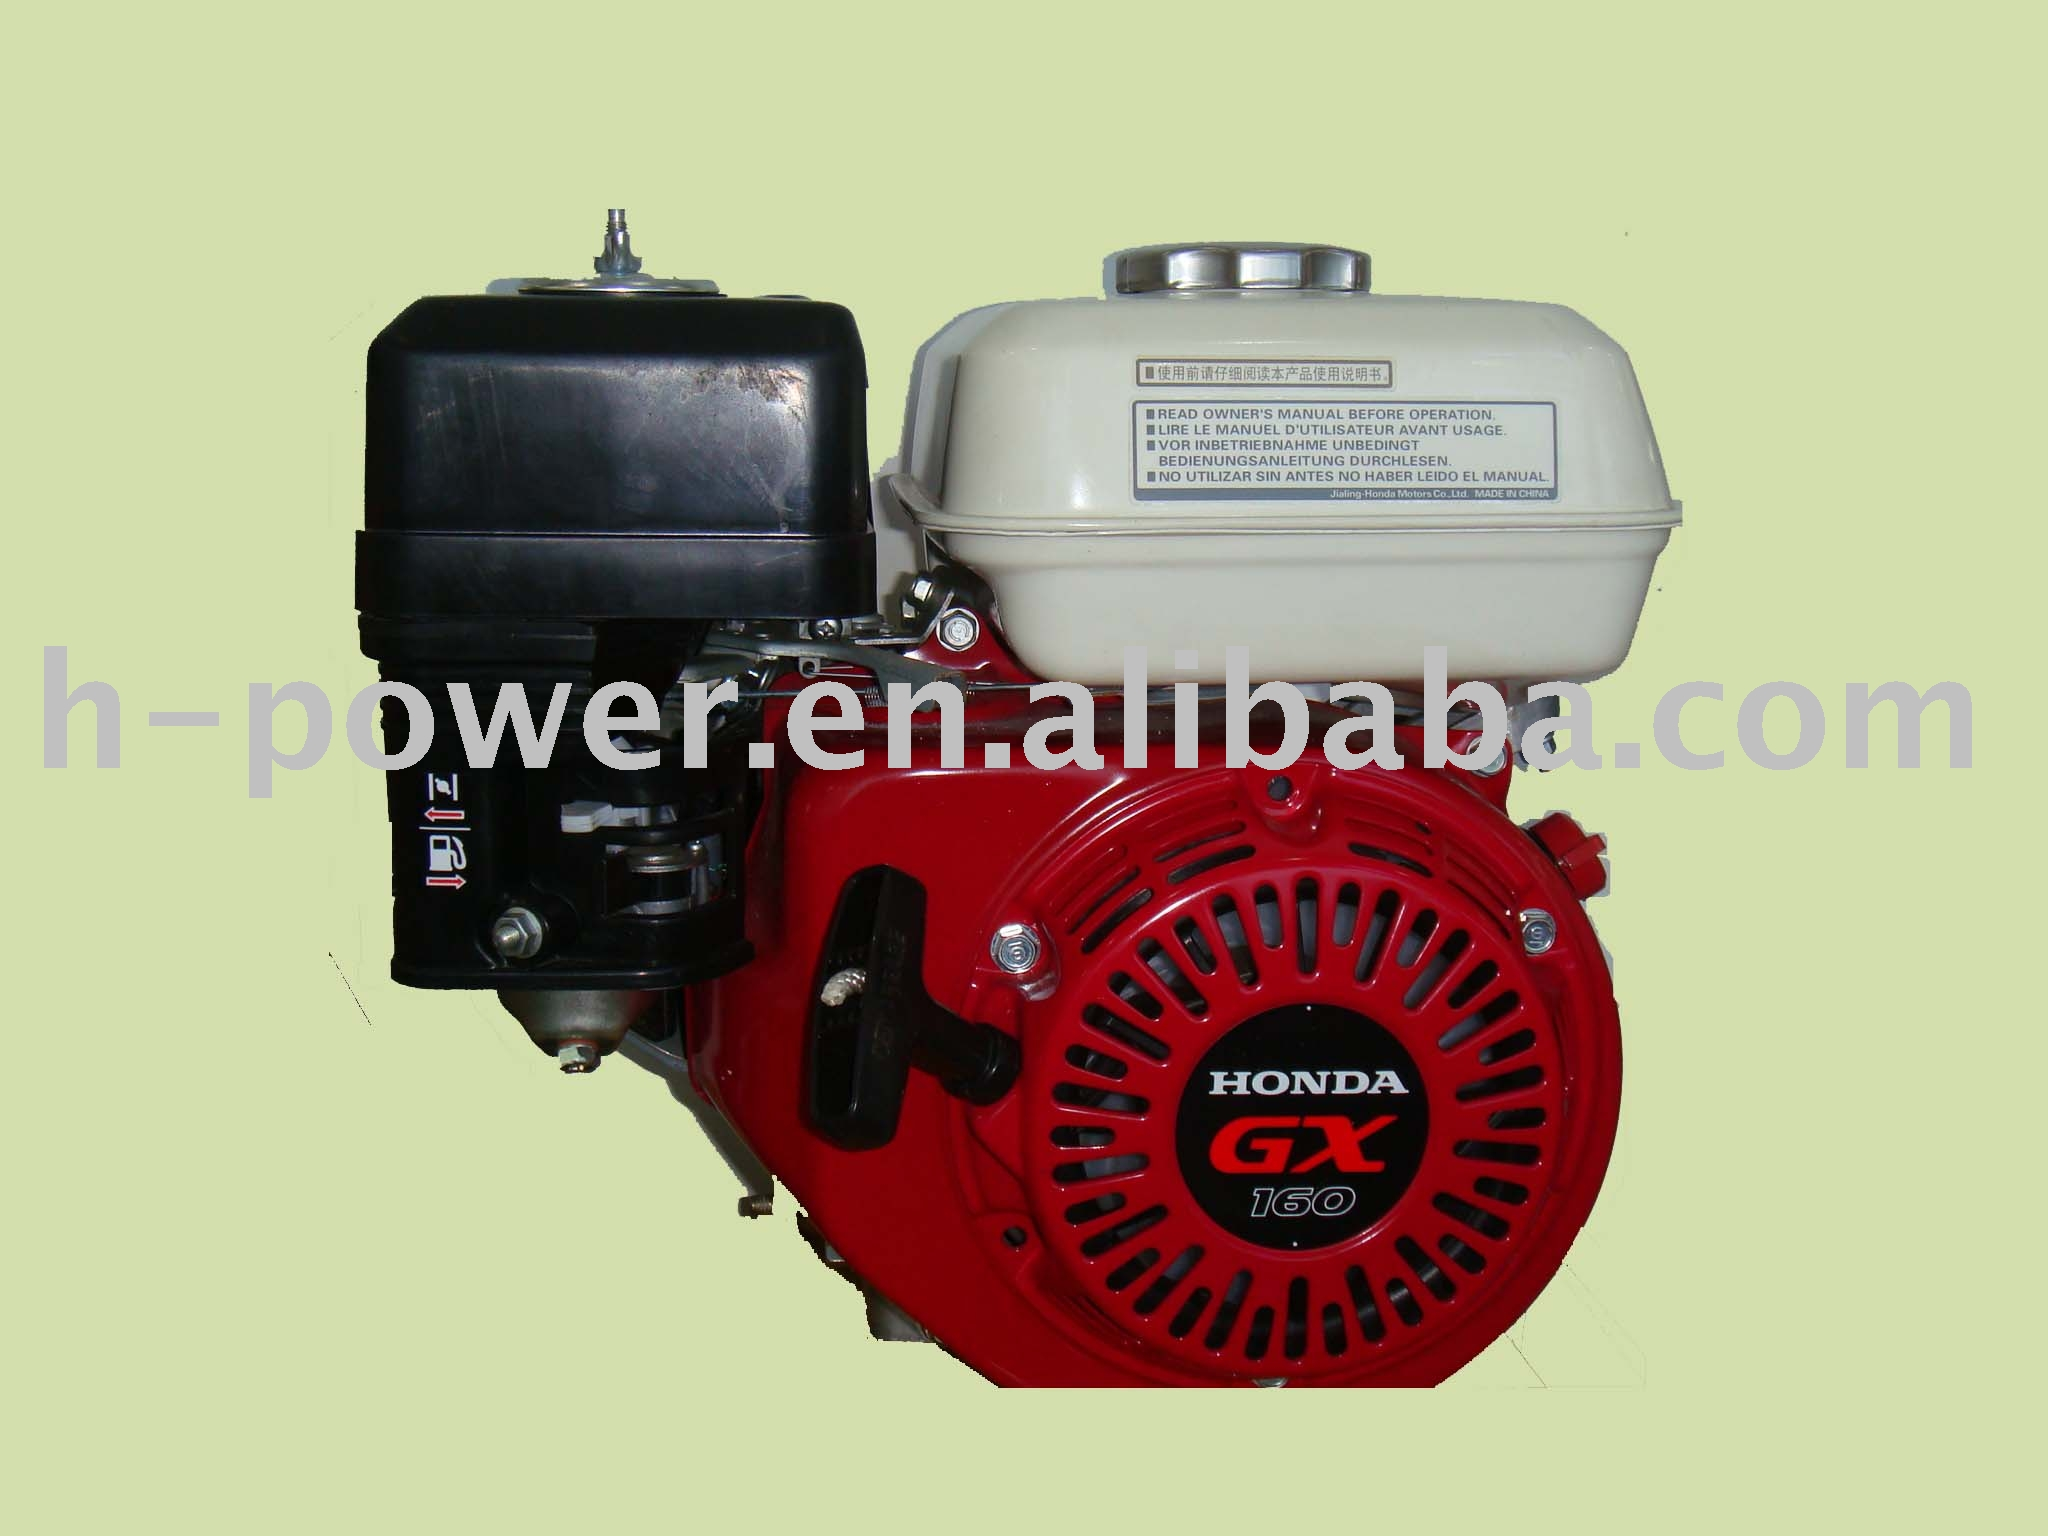 aeb engine wiring diagram engine camshaft diagram wiring